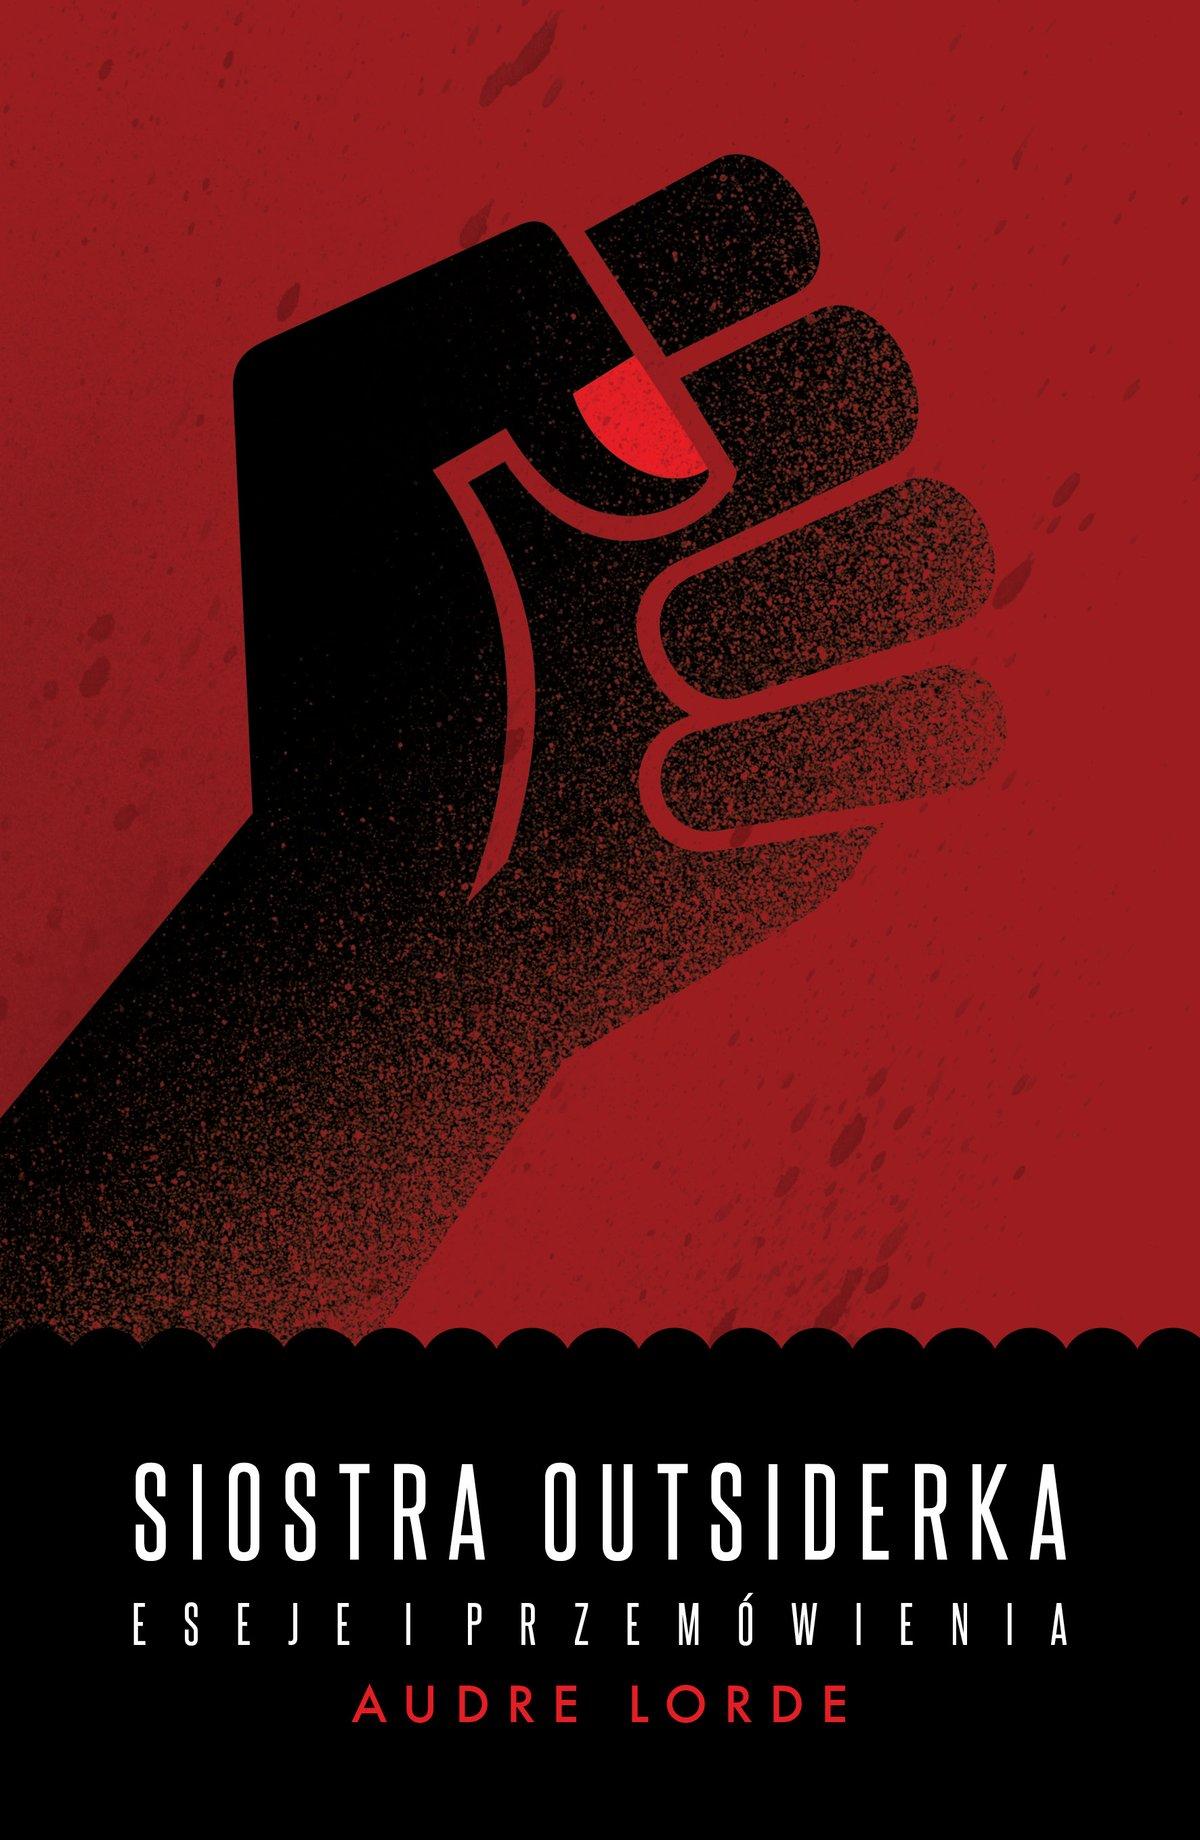 Siostra Outsiderka - Ebook (Książka na Kindle) do pobrania w formacie MOBI